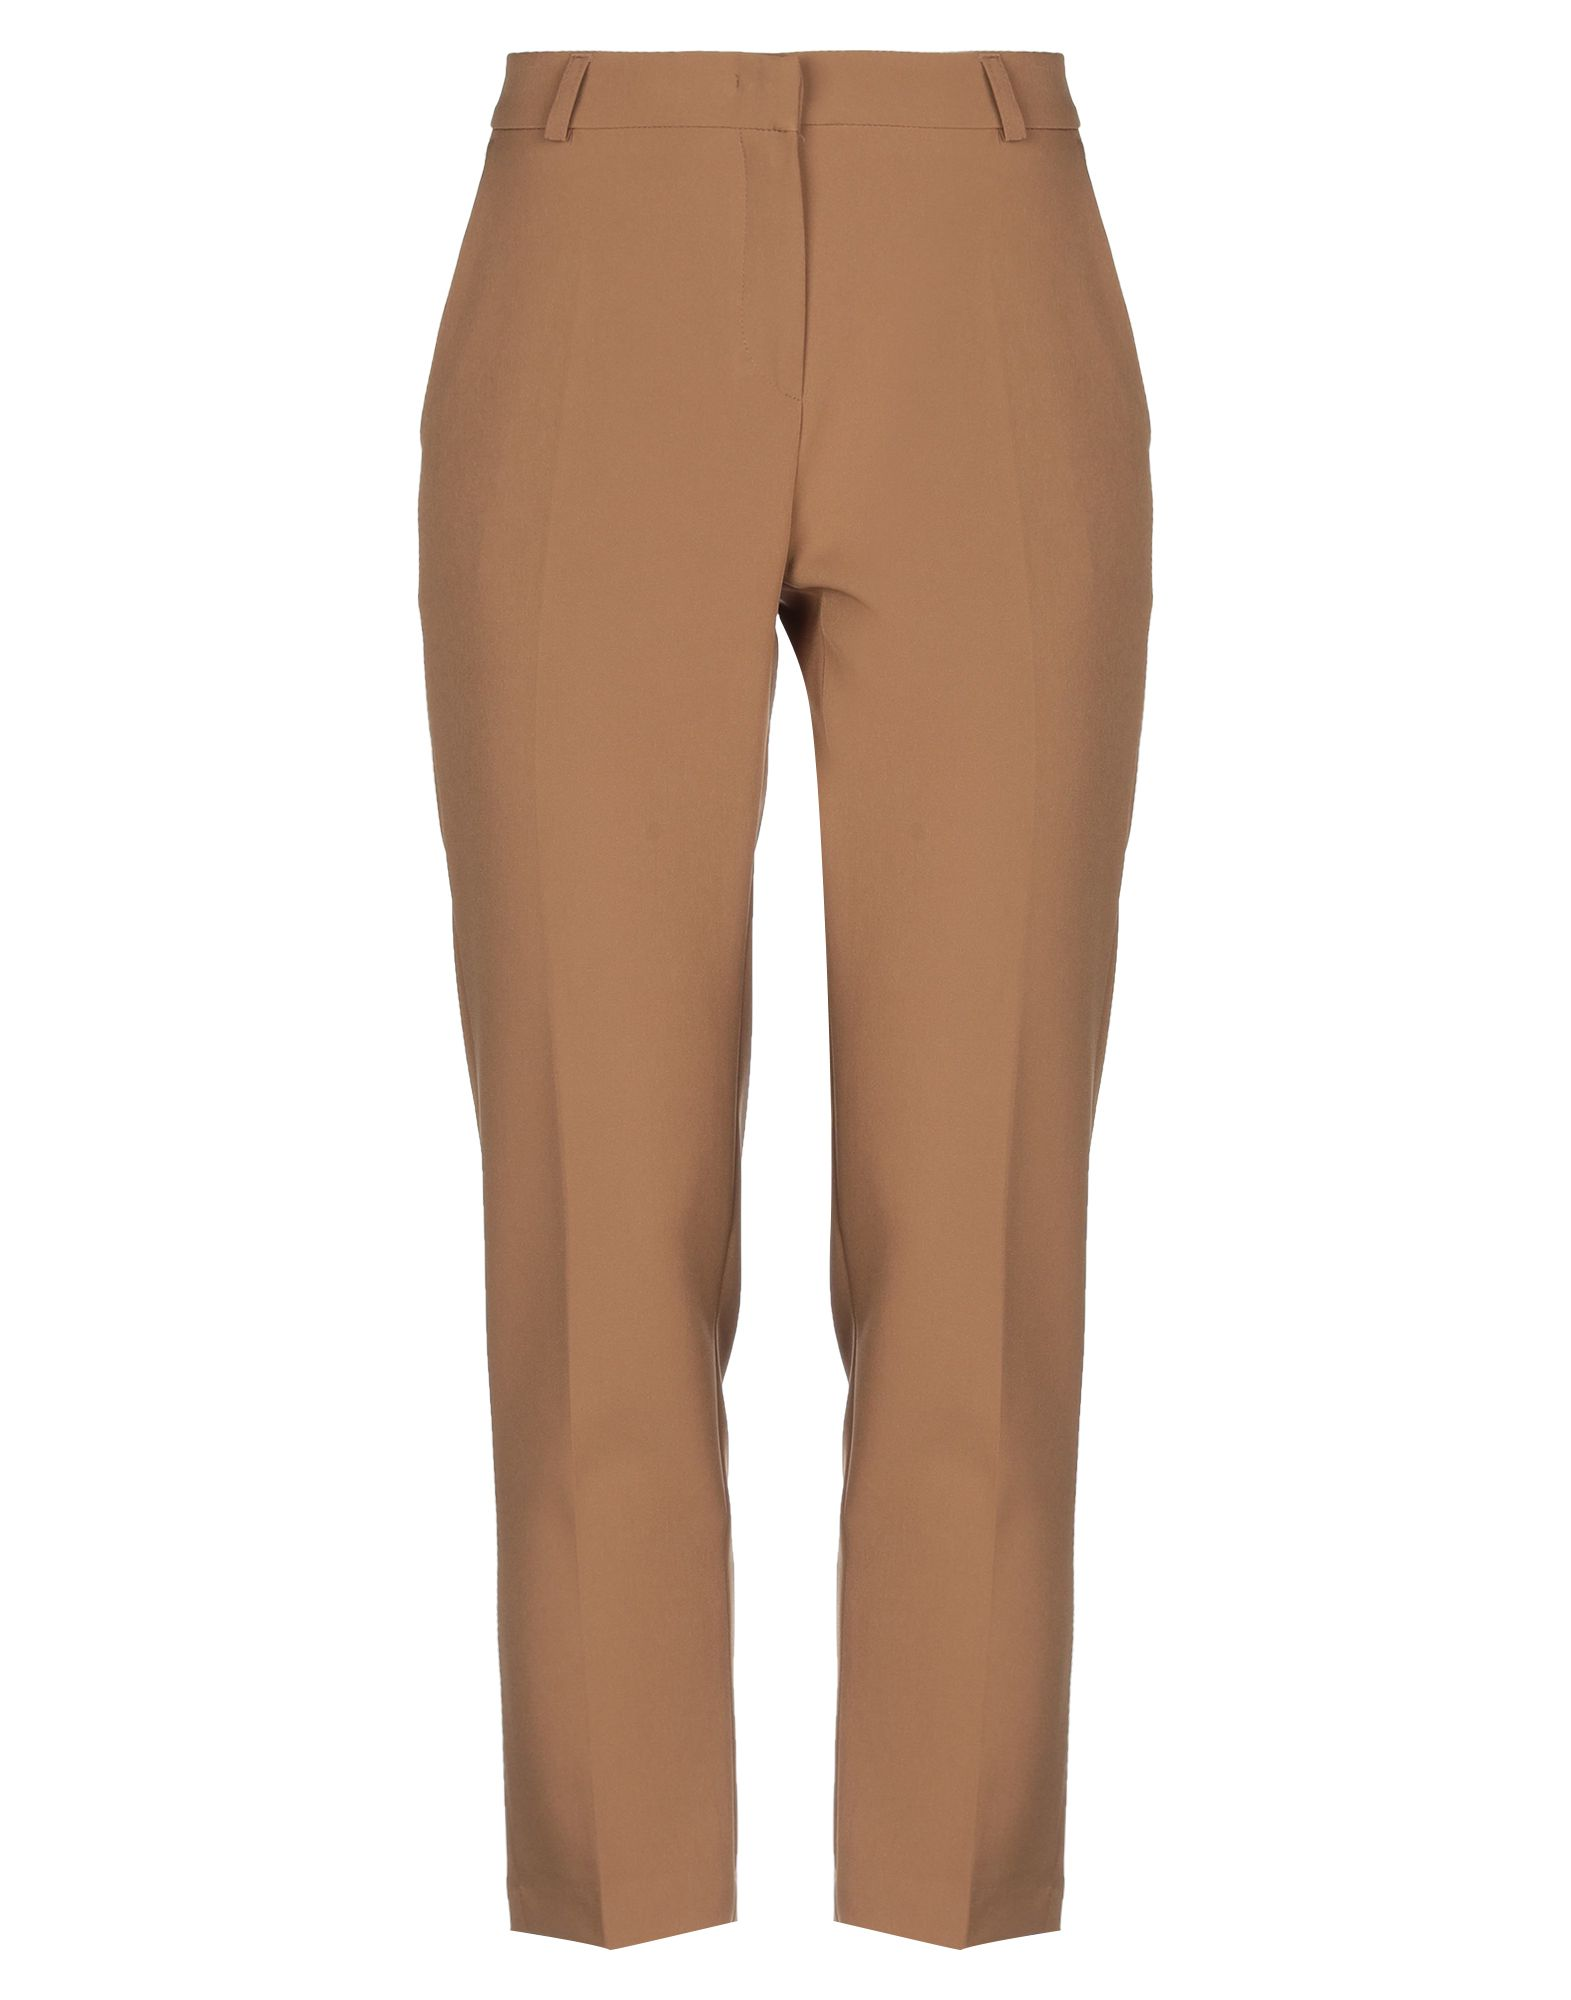 Pantalone Hope Collection donna donna donna - 13365507TB a6c